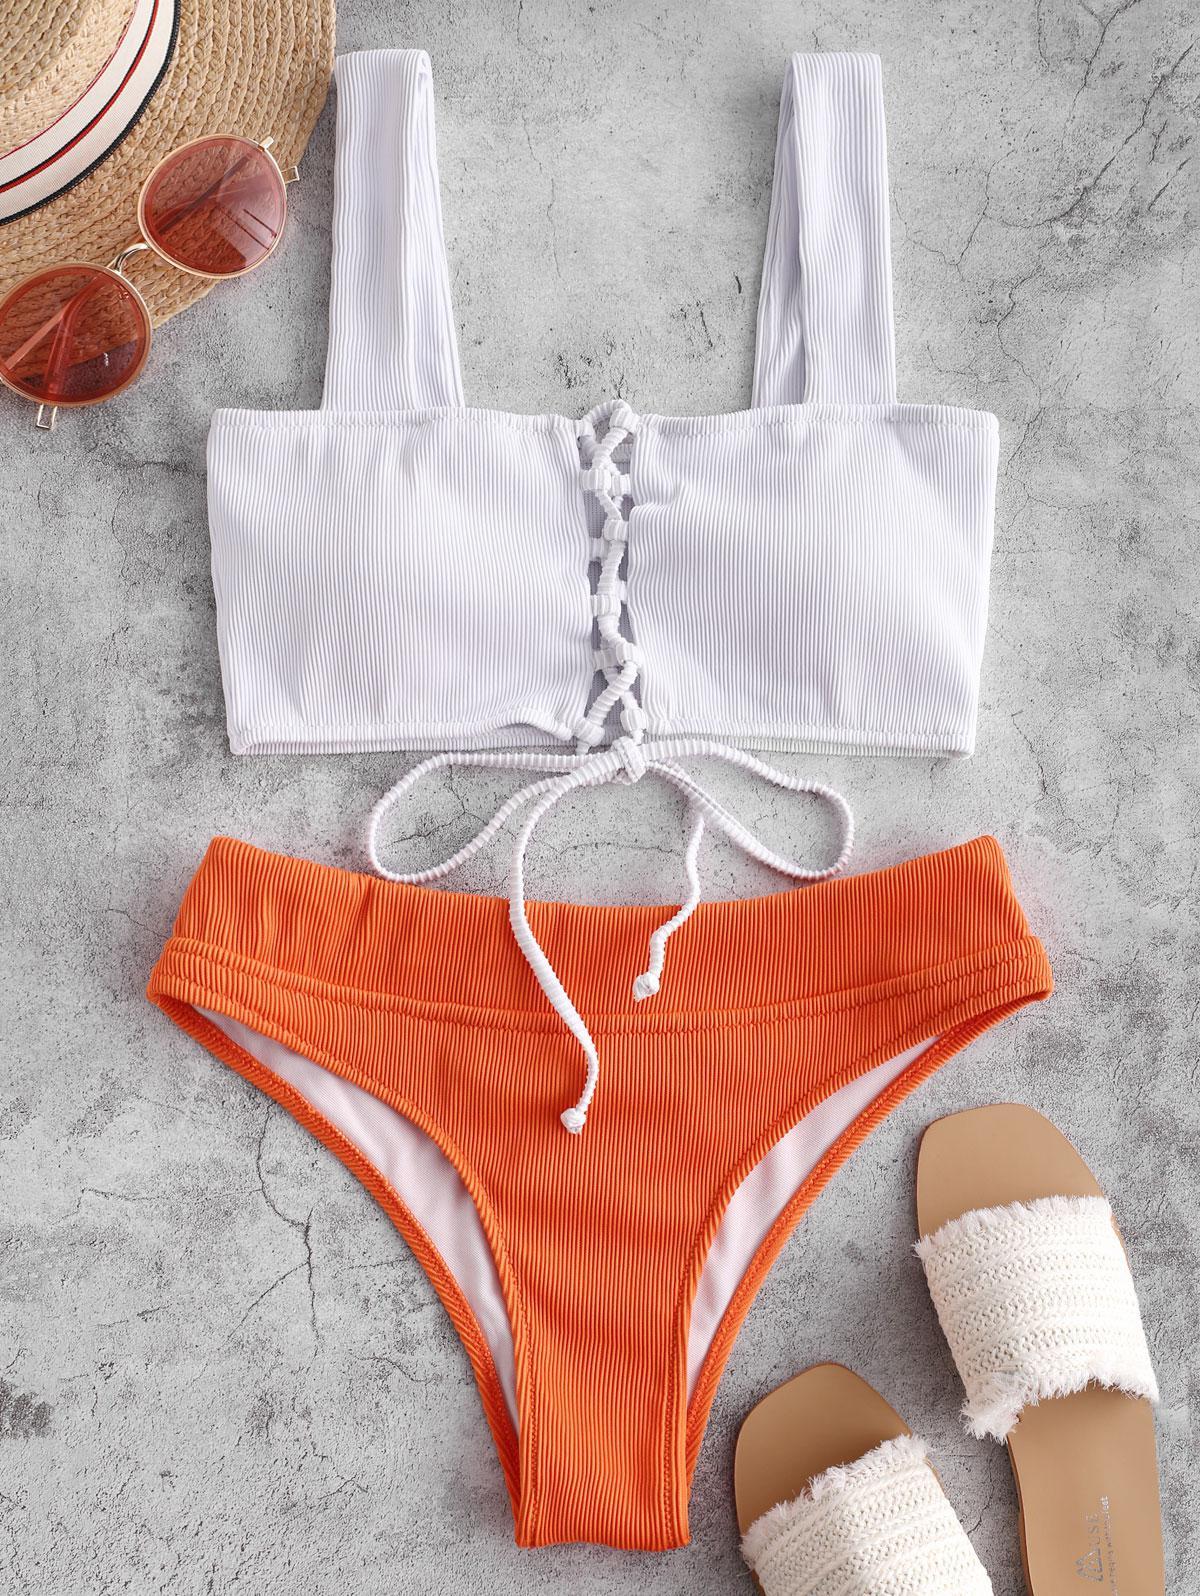 ZAFUL Texture Côtelée lacets Maillot de bain Bikini